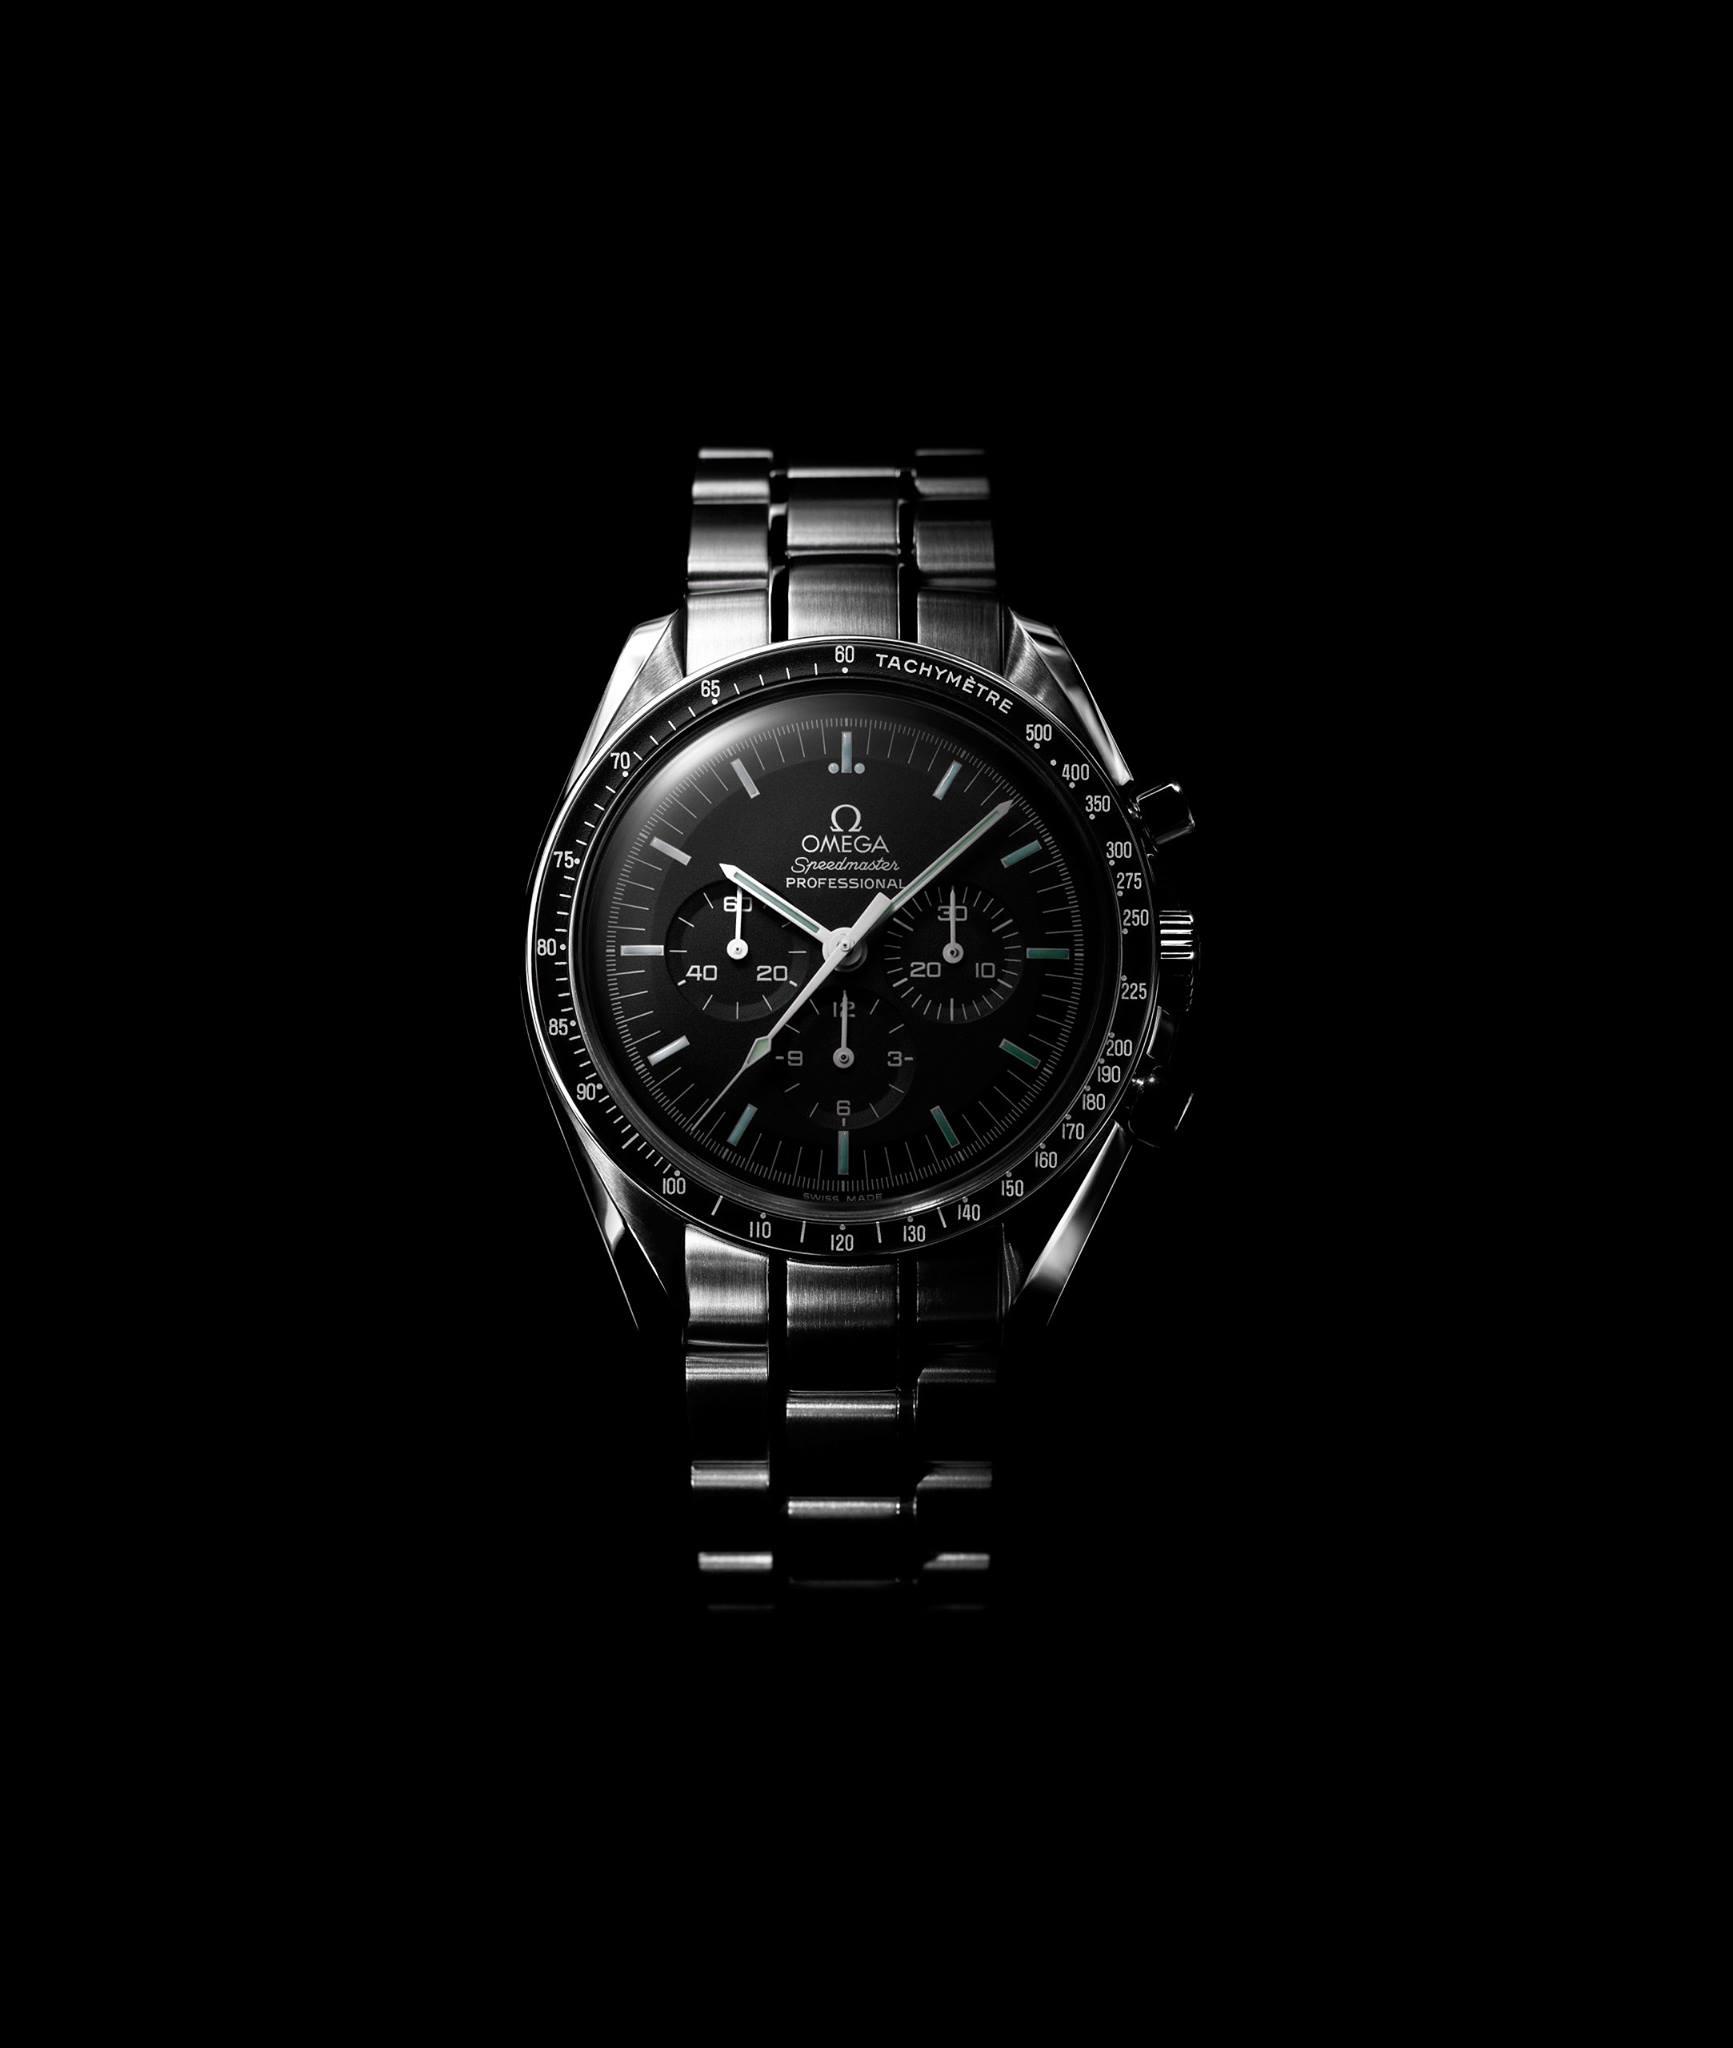 Omega Speedmaster Apollo XIII-new watch